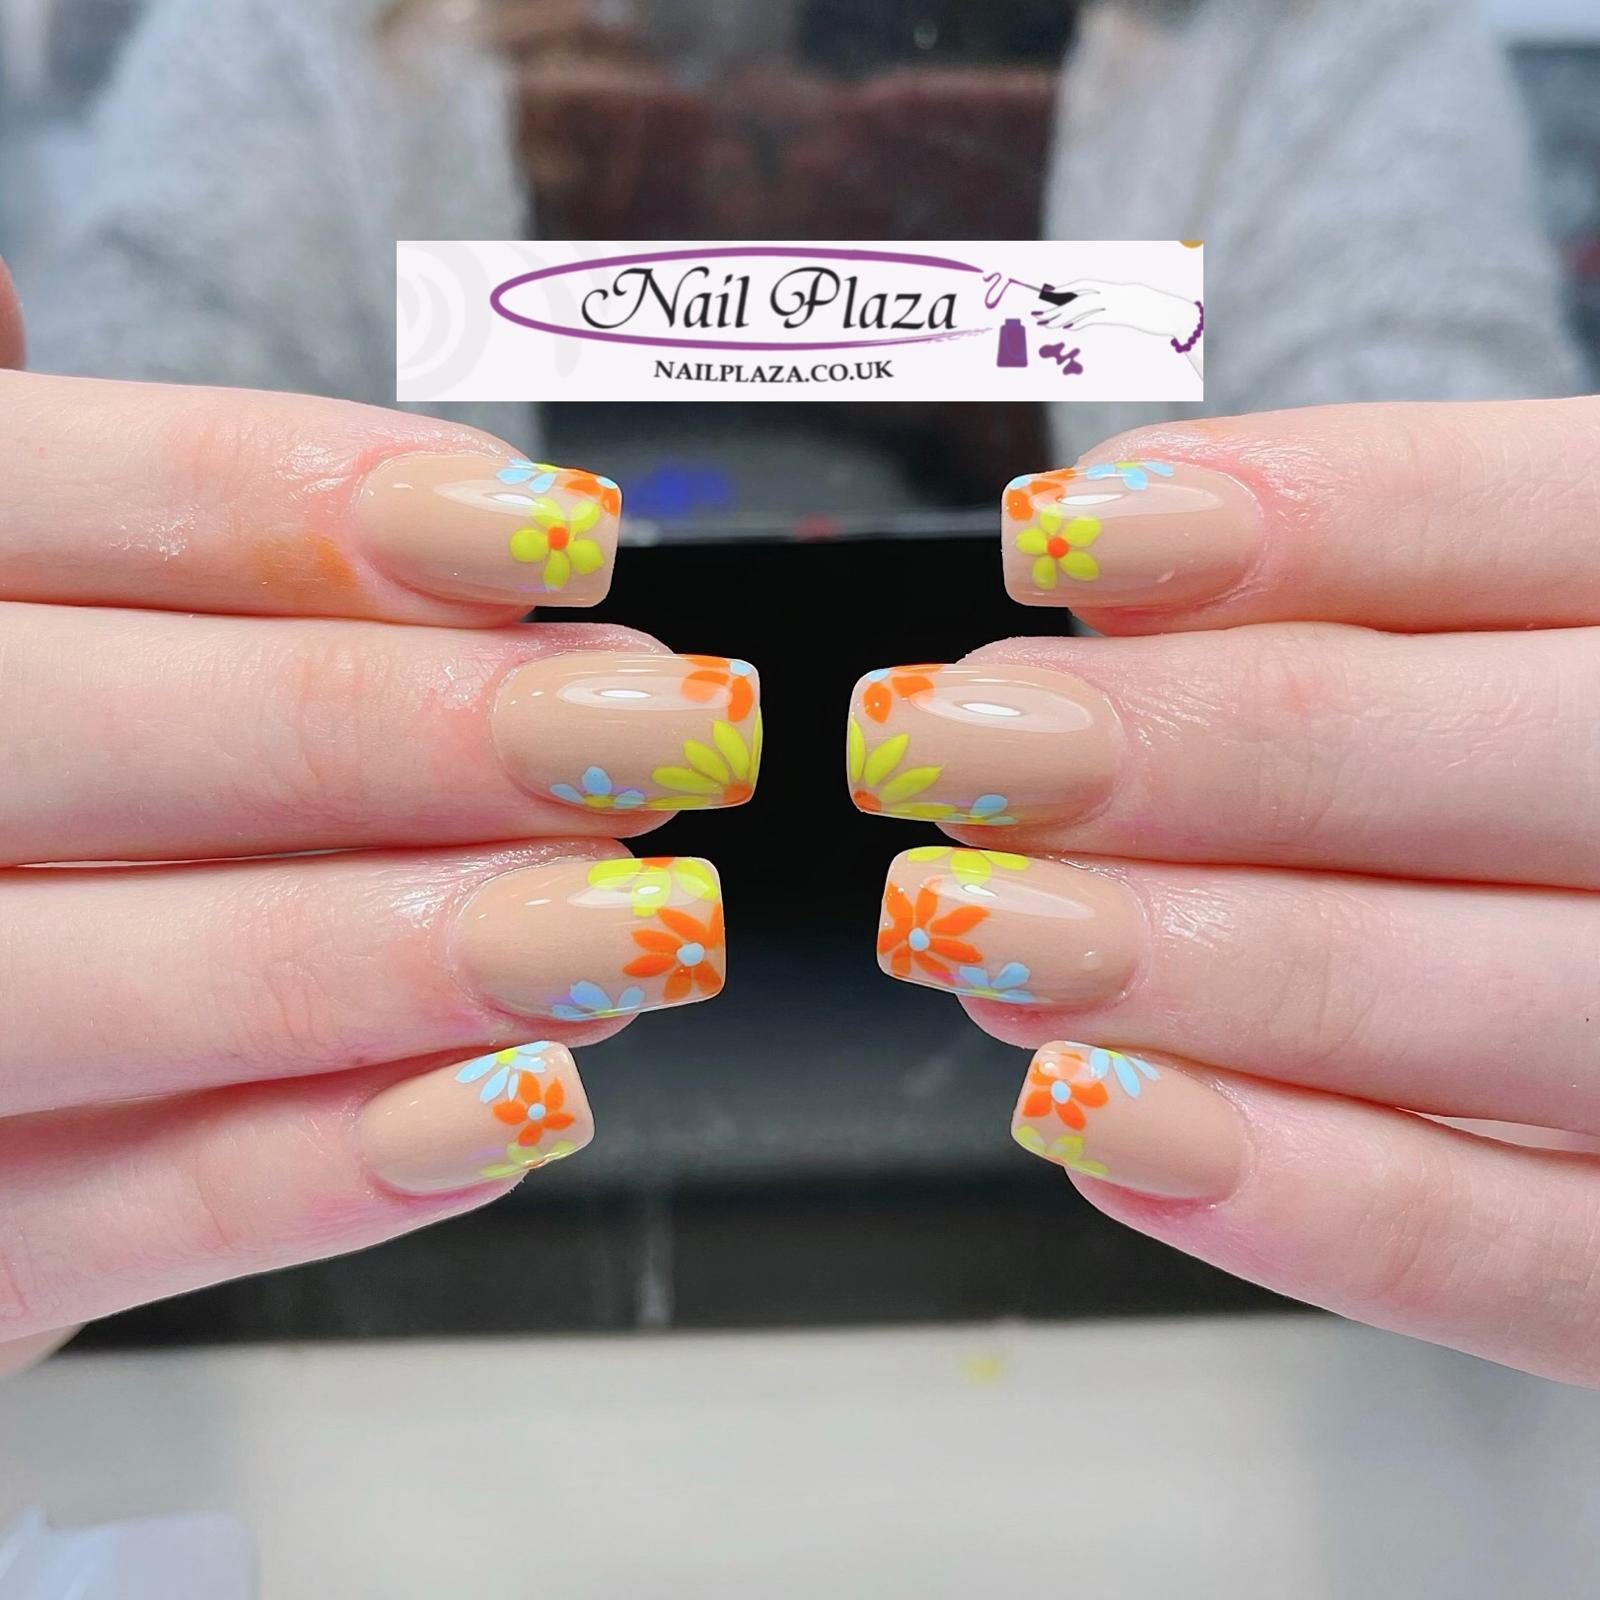 nail-plaza-twickenham-080521-8